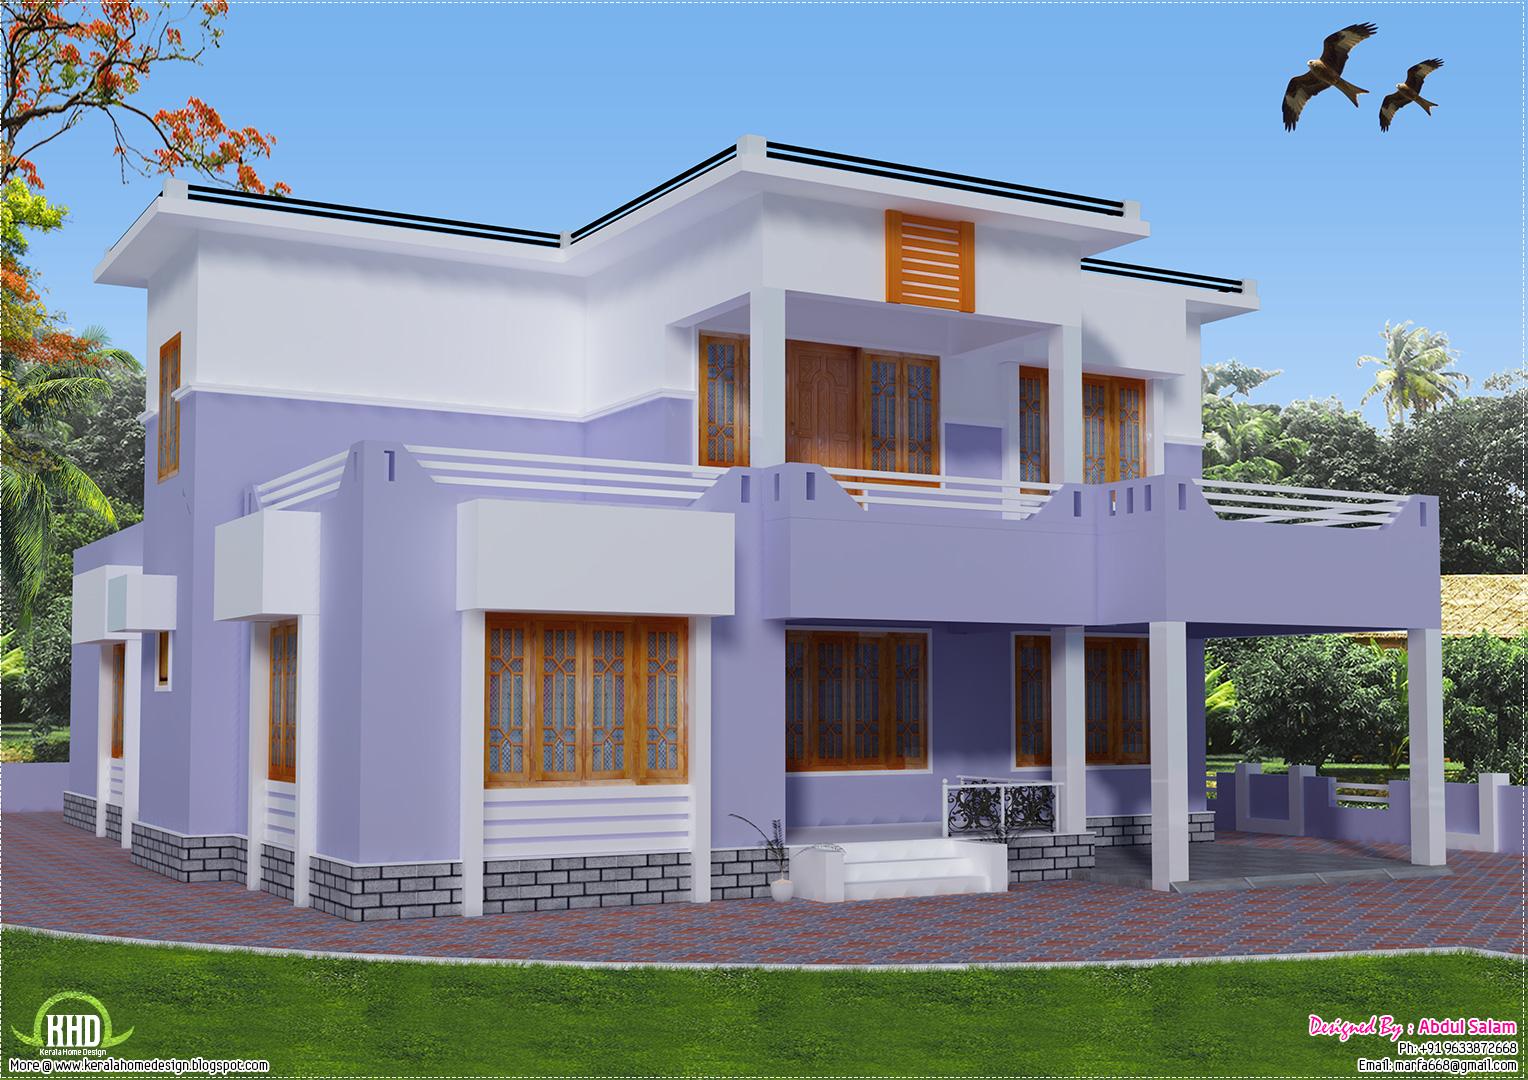 2419 sq.feet flat roof house design - Kerala home design ...